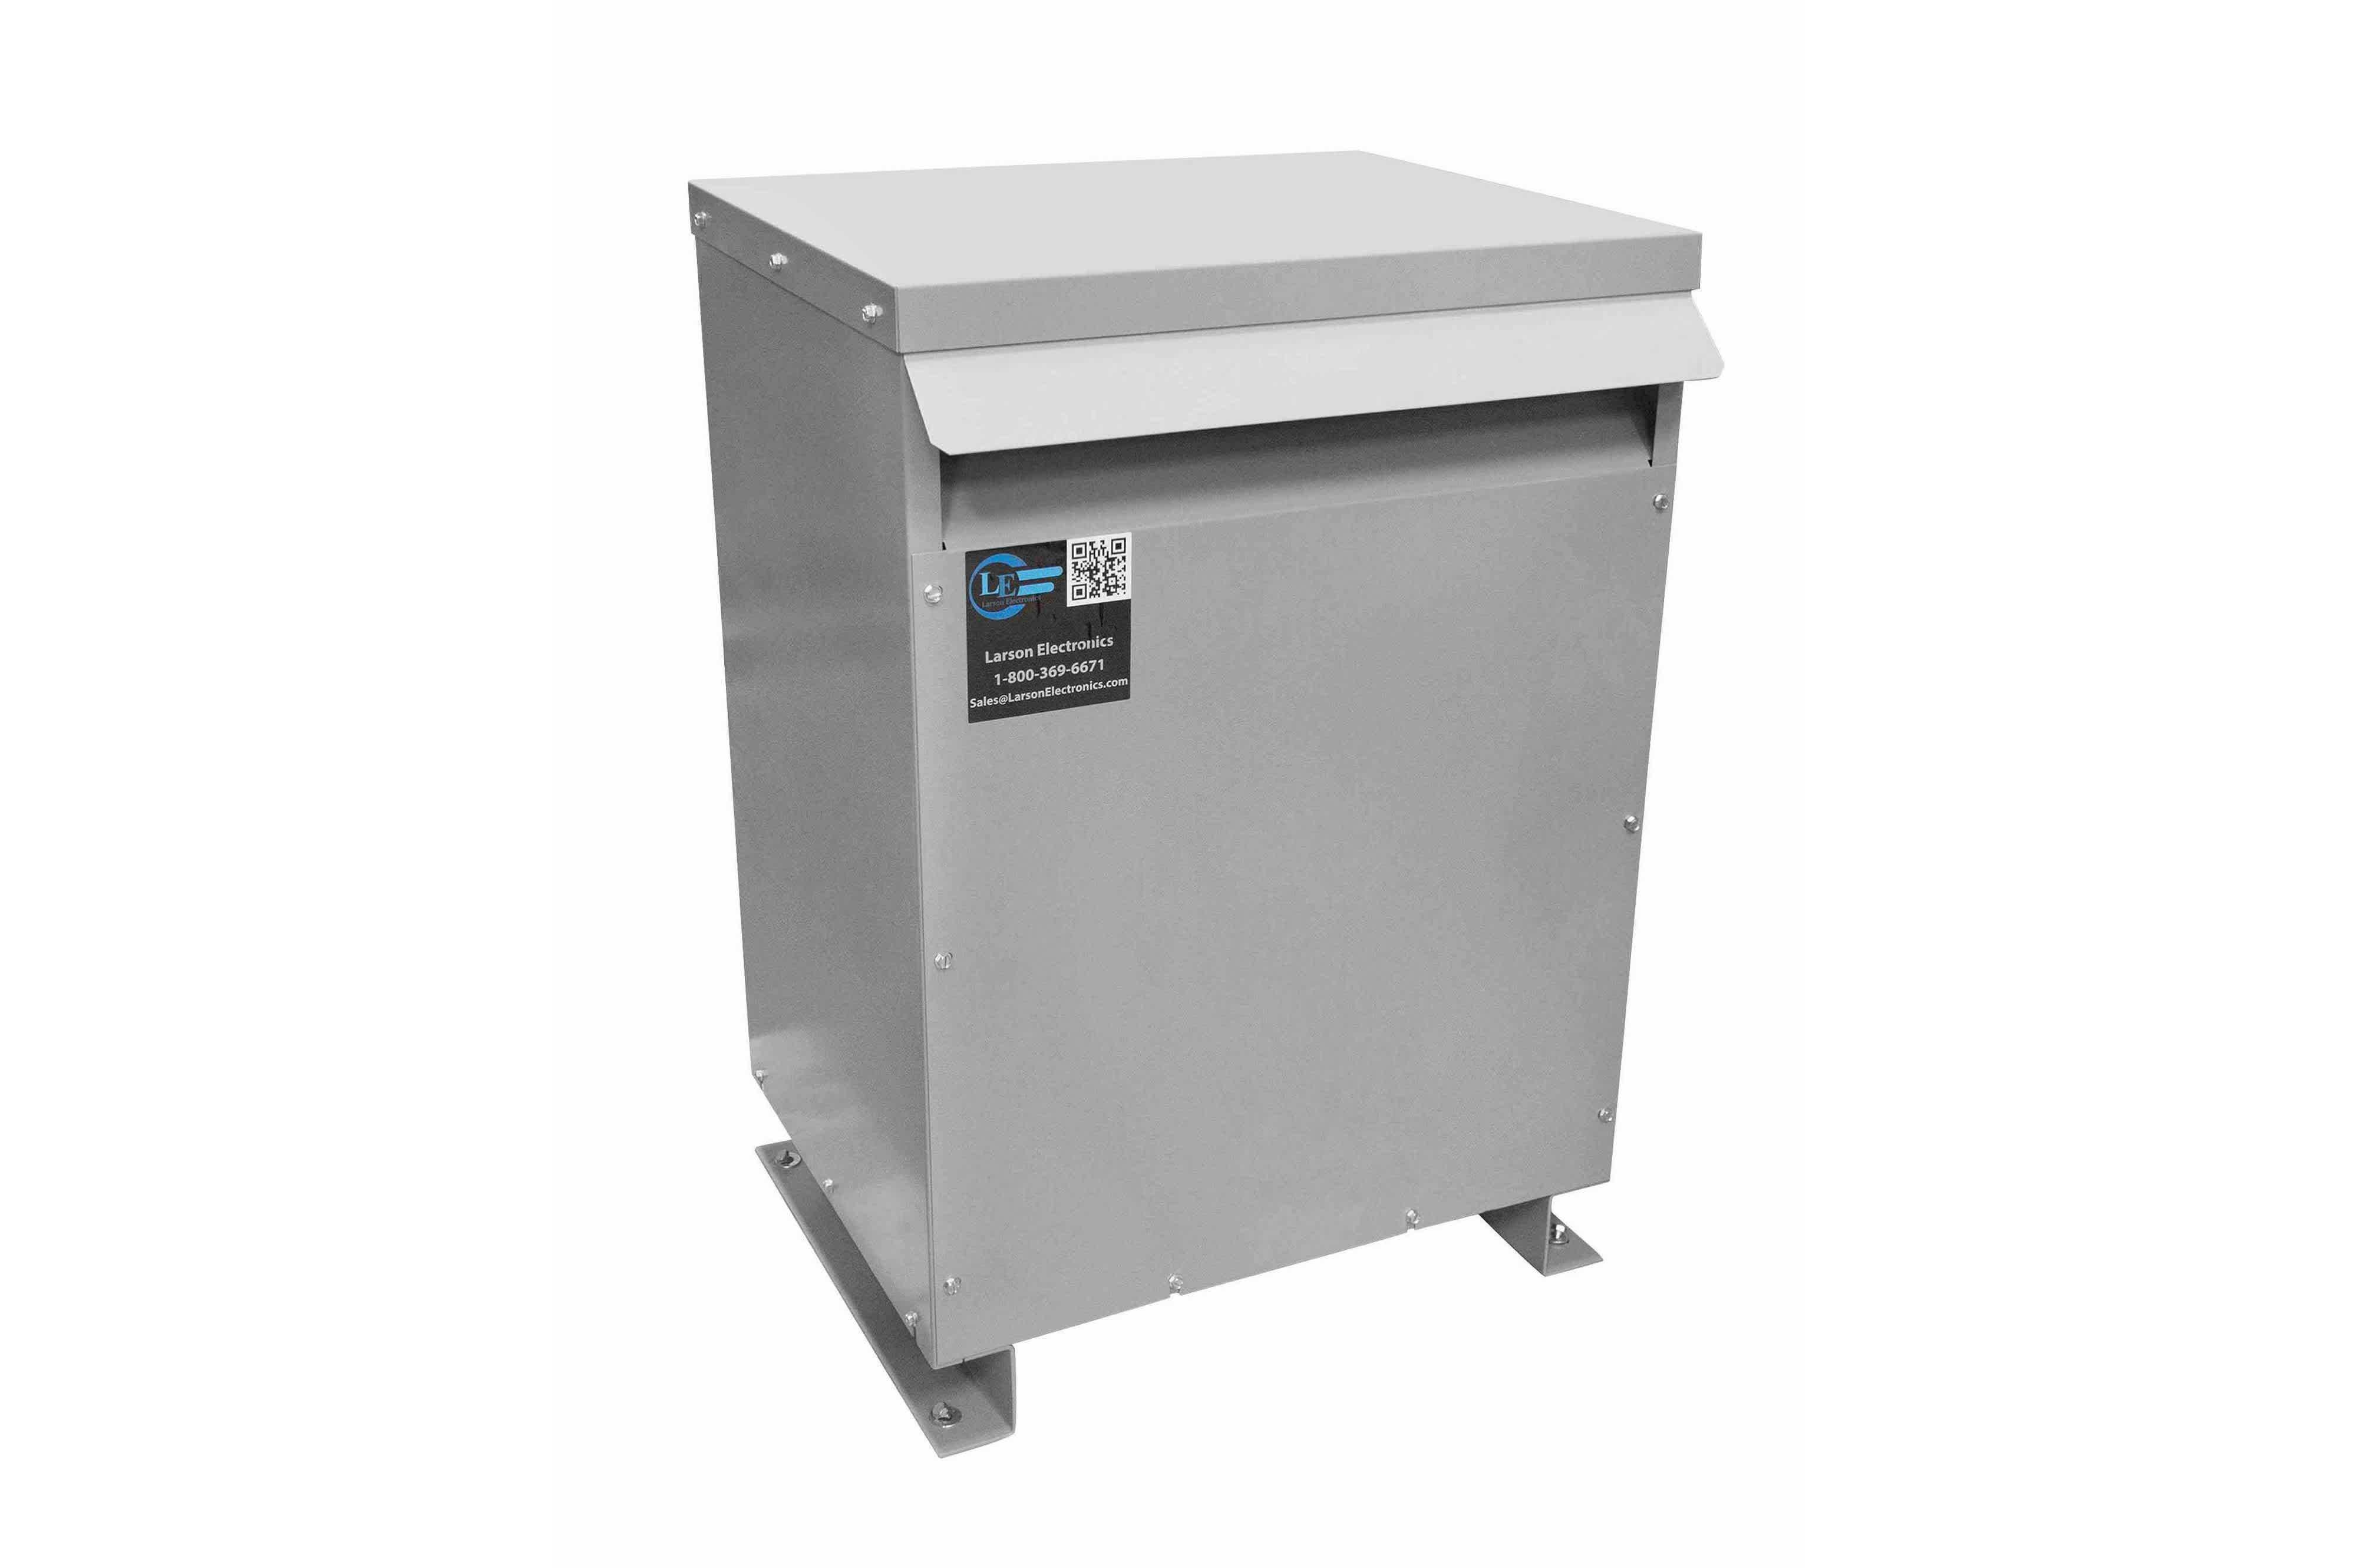 70 kVA 3PH Isolation Transformer, 575V Wye Primary, 208Y/120 Wye-N Secondary, N3R, Ventilated, 60 Hz